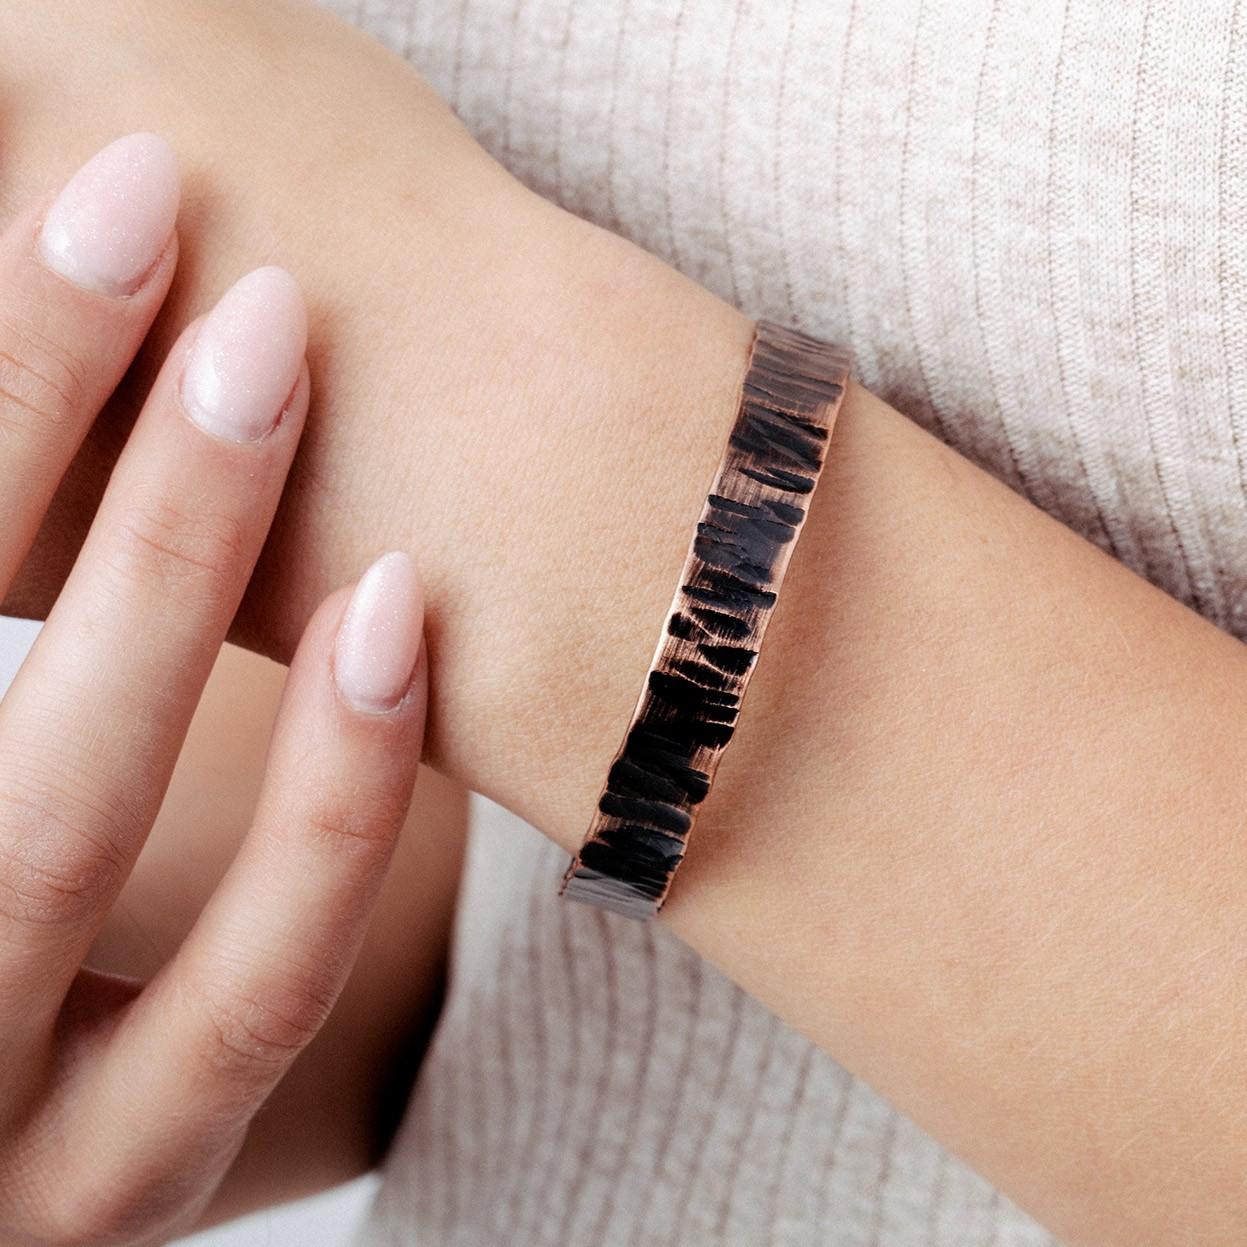 Copper bracelet with black shape